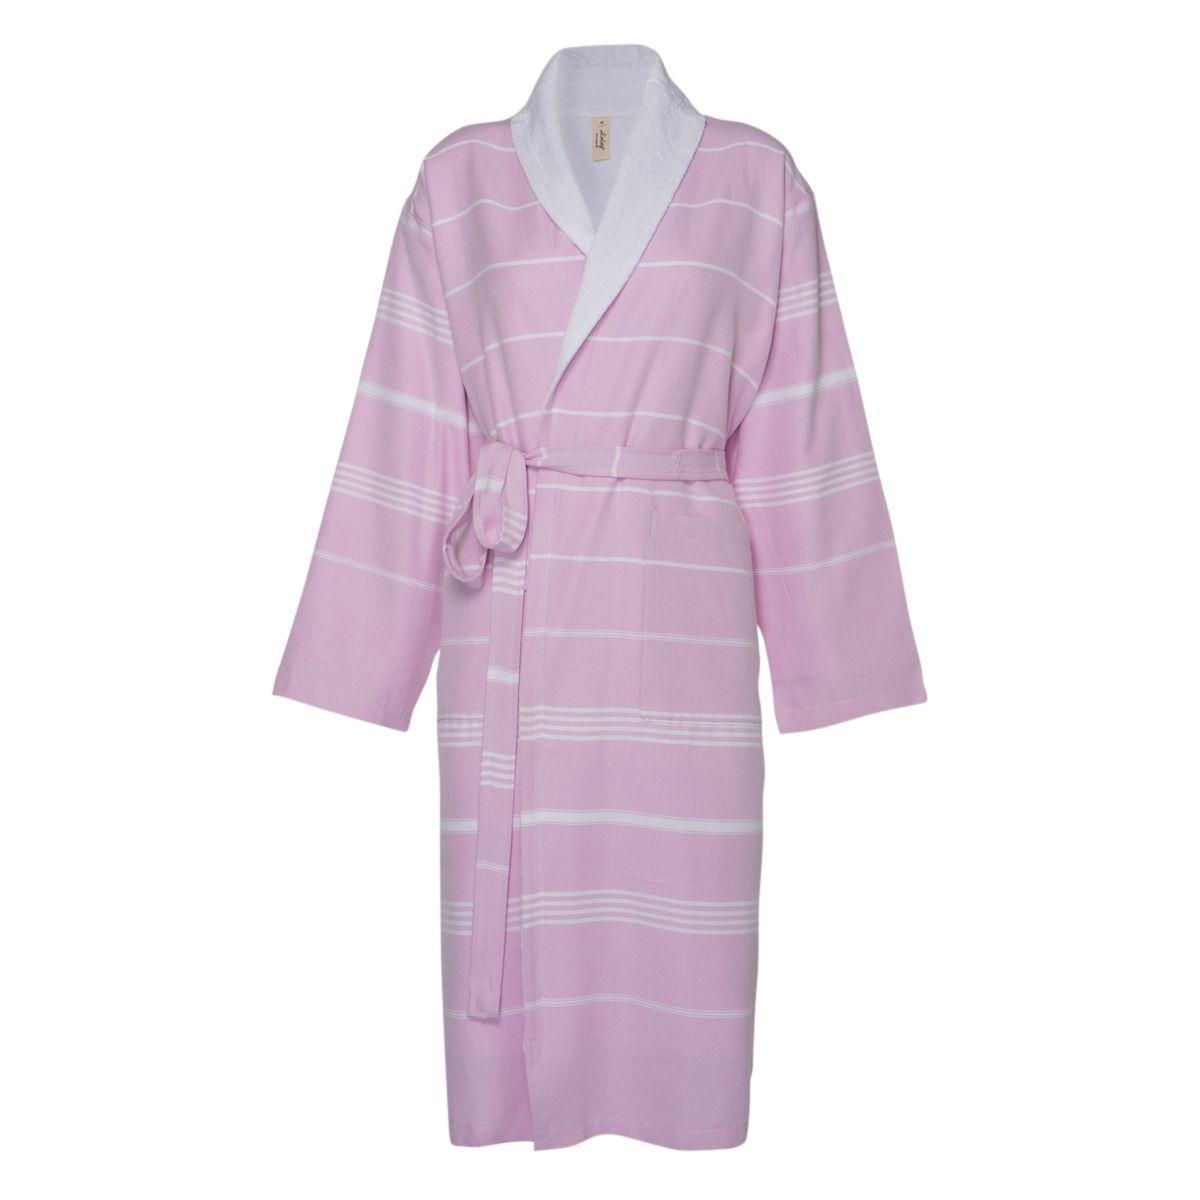 Bathrobe Leyla / With Towel Lining - Pink